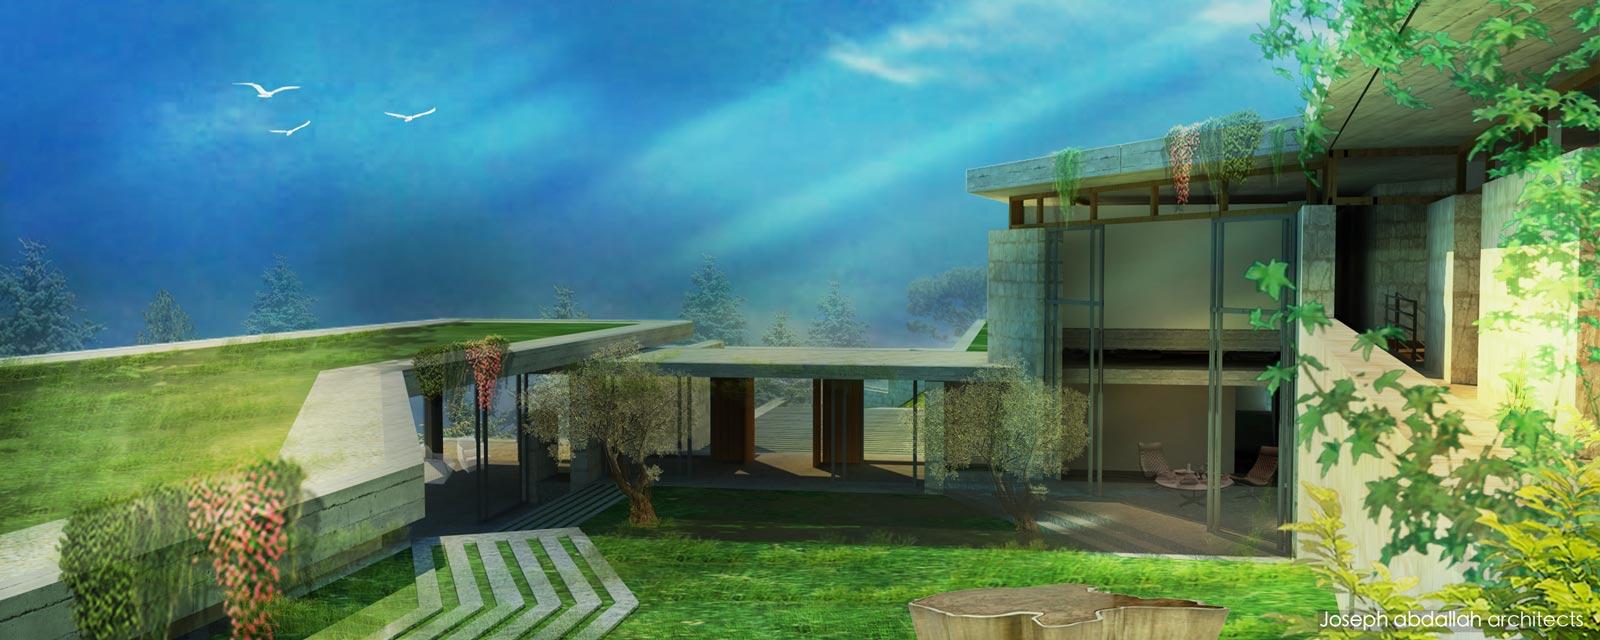 bakhos-nassif-eagle-nest-villa-lebanon-joseph-abdallah-architects-3